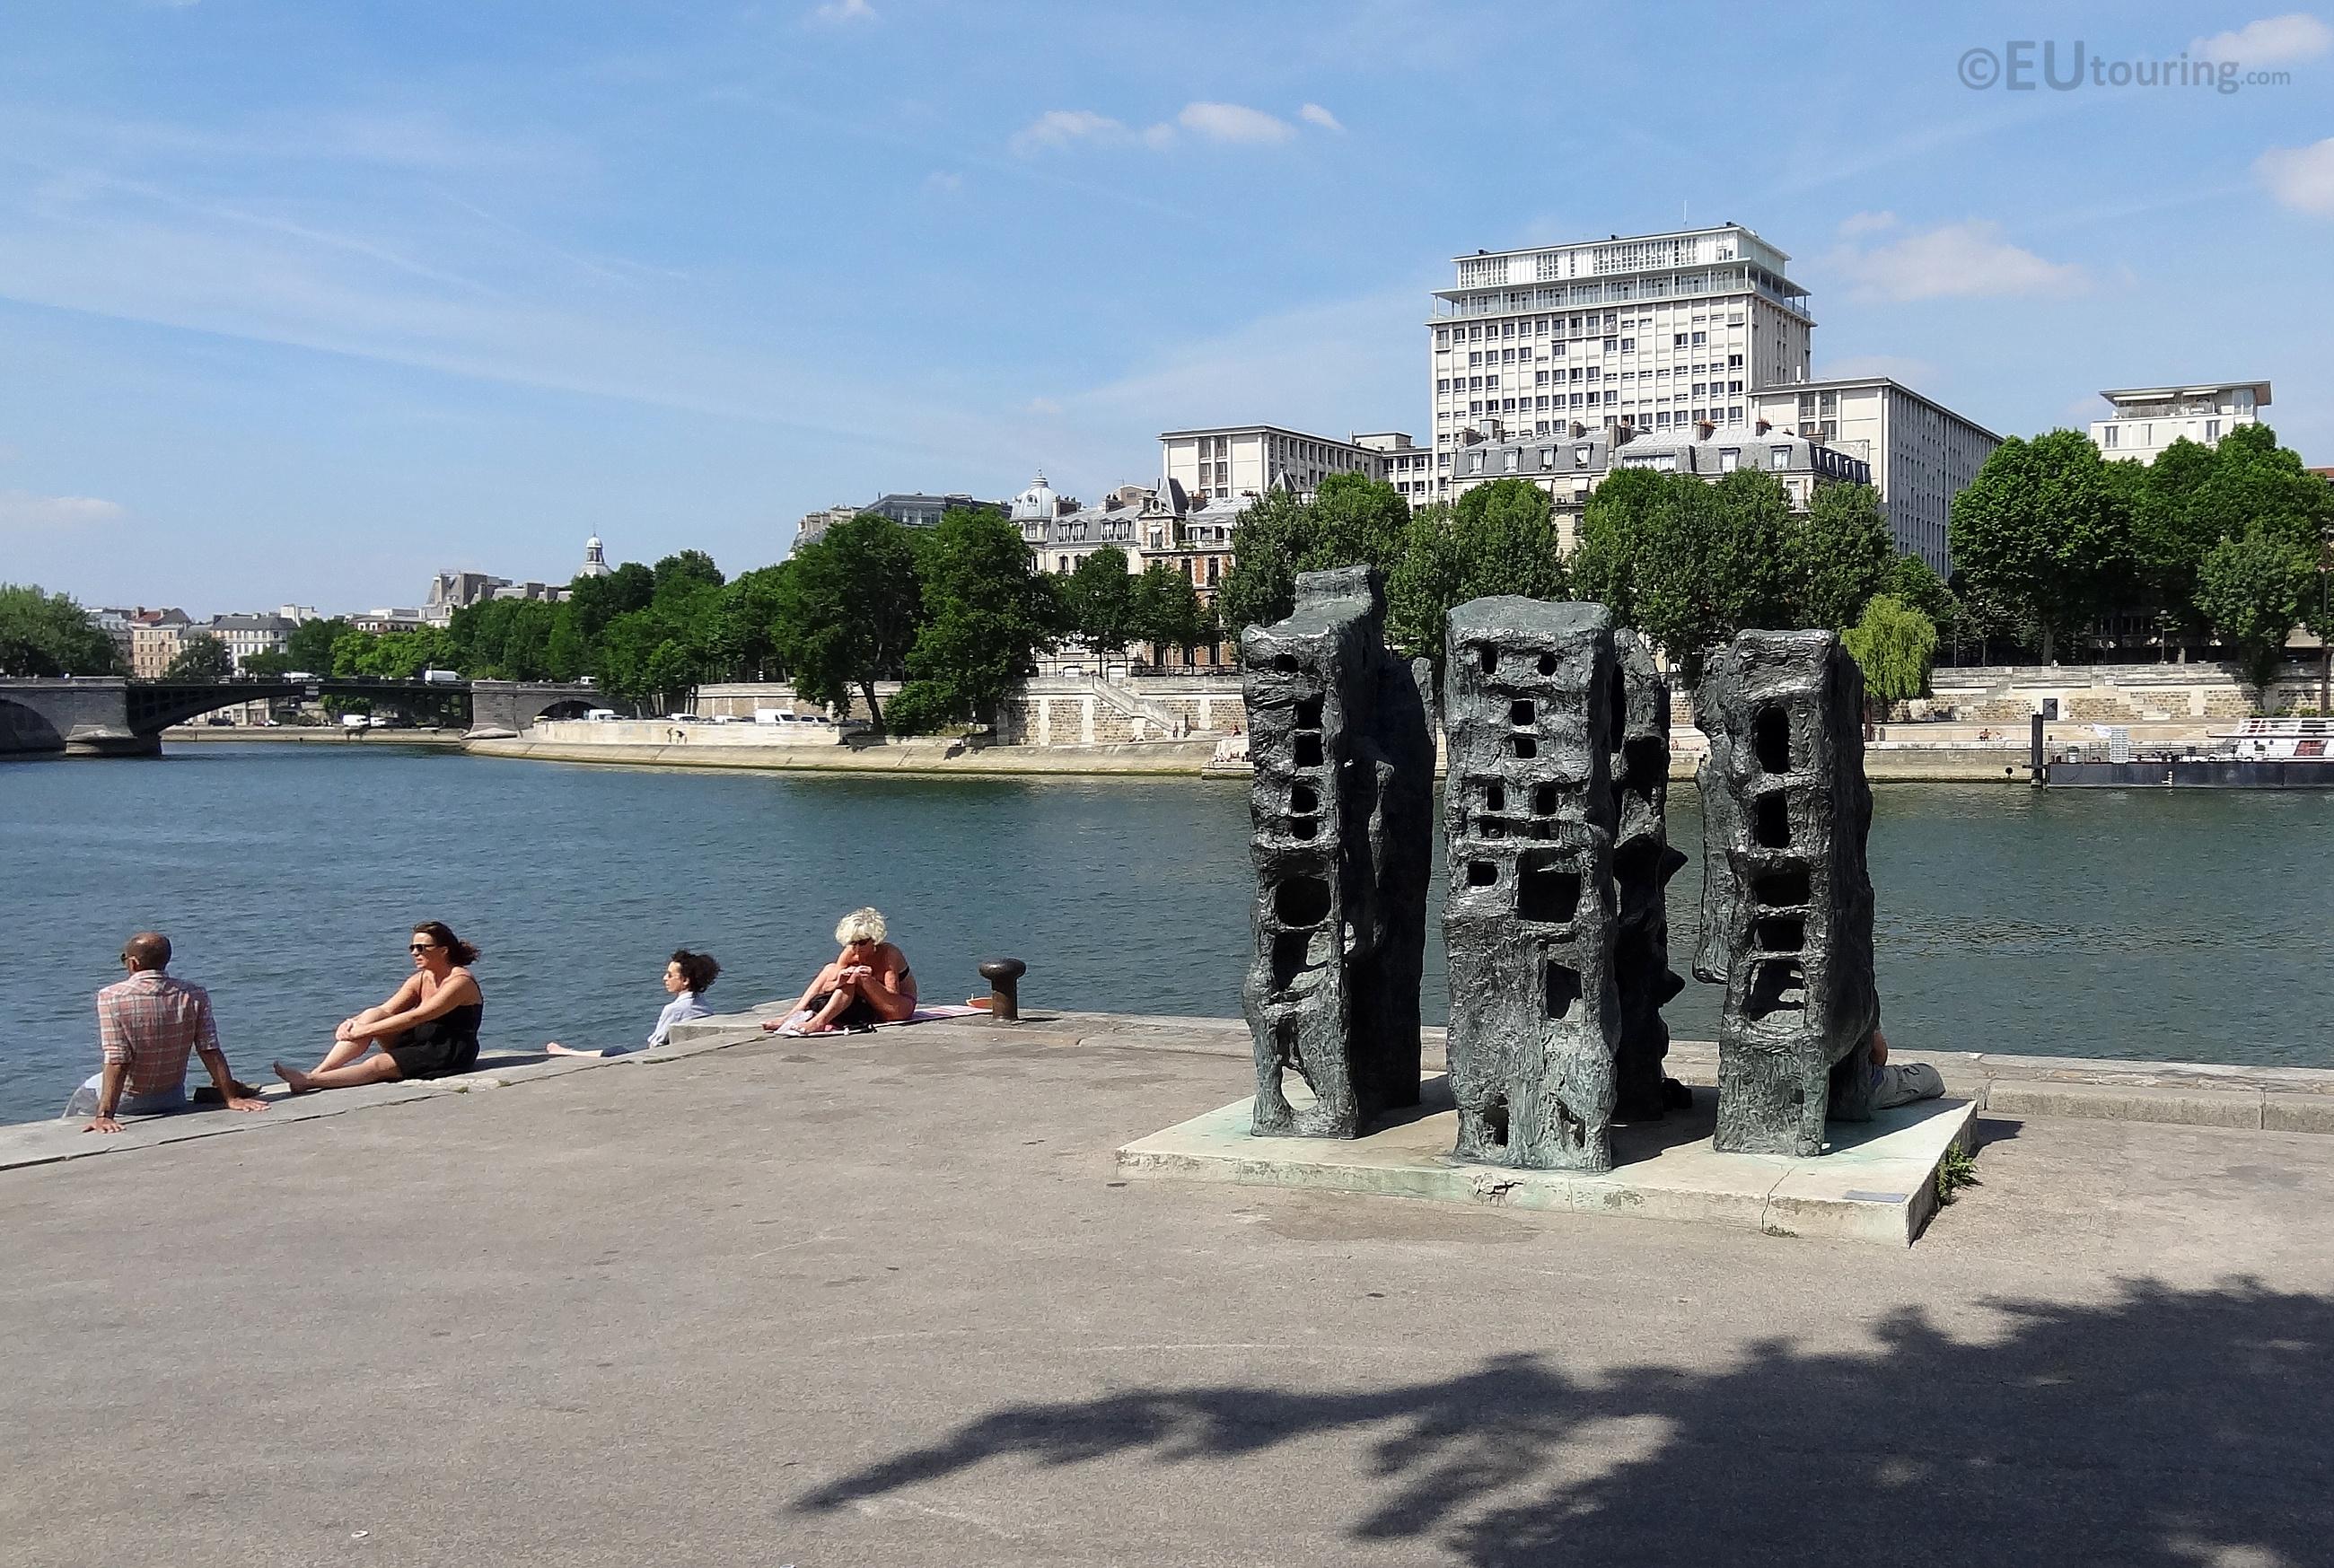 Sculpture beside the River Seine